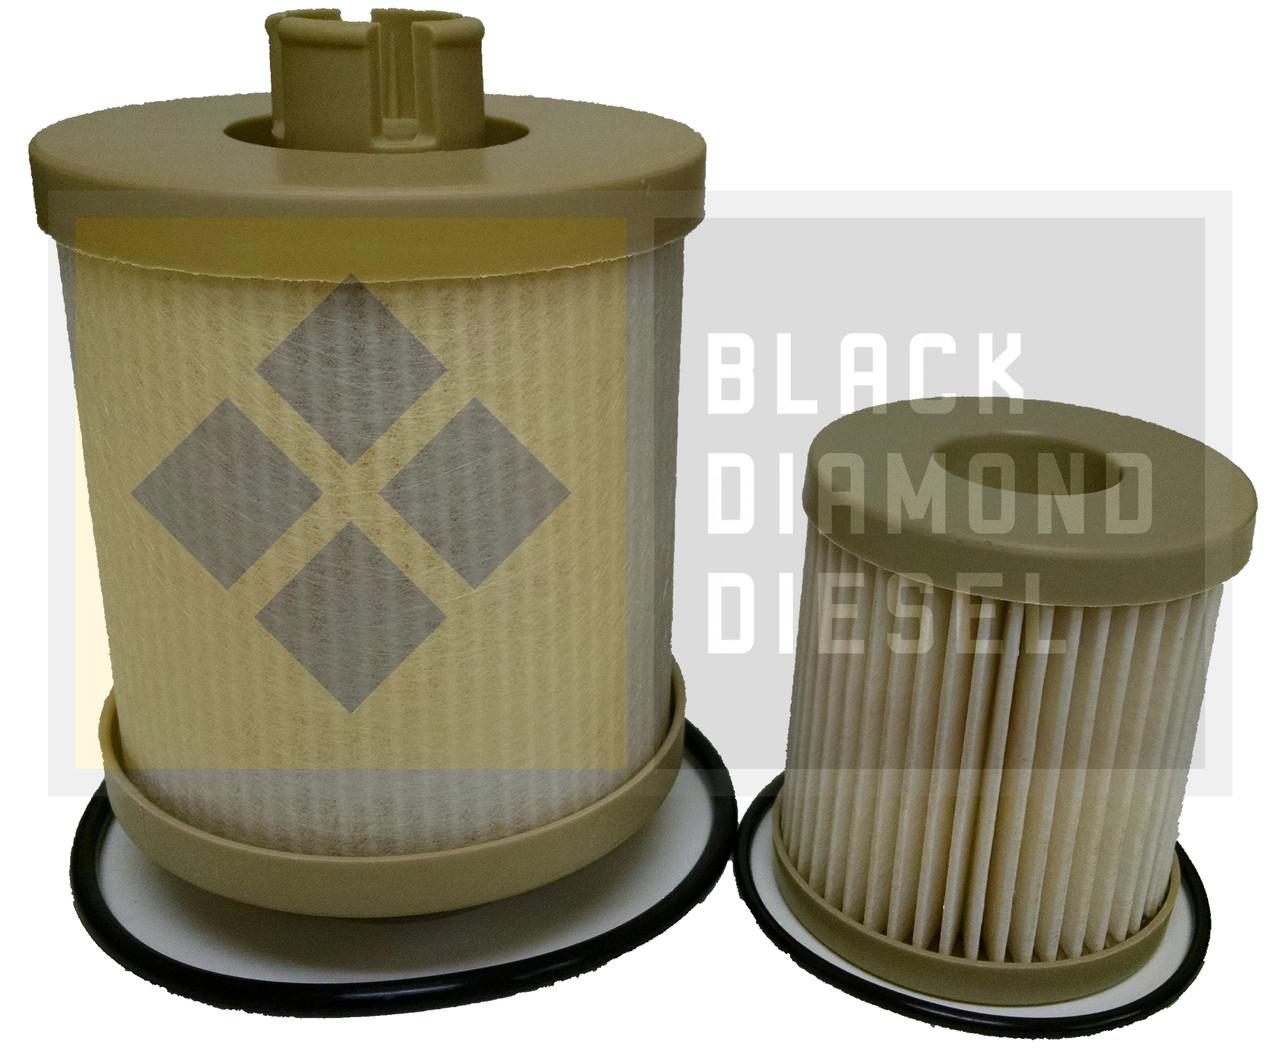 Prime Guard Fuel Filter Fits 2003-2007 Ford Superduty 6.0 Powerstroke Diesel